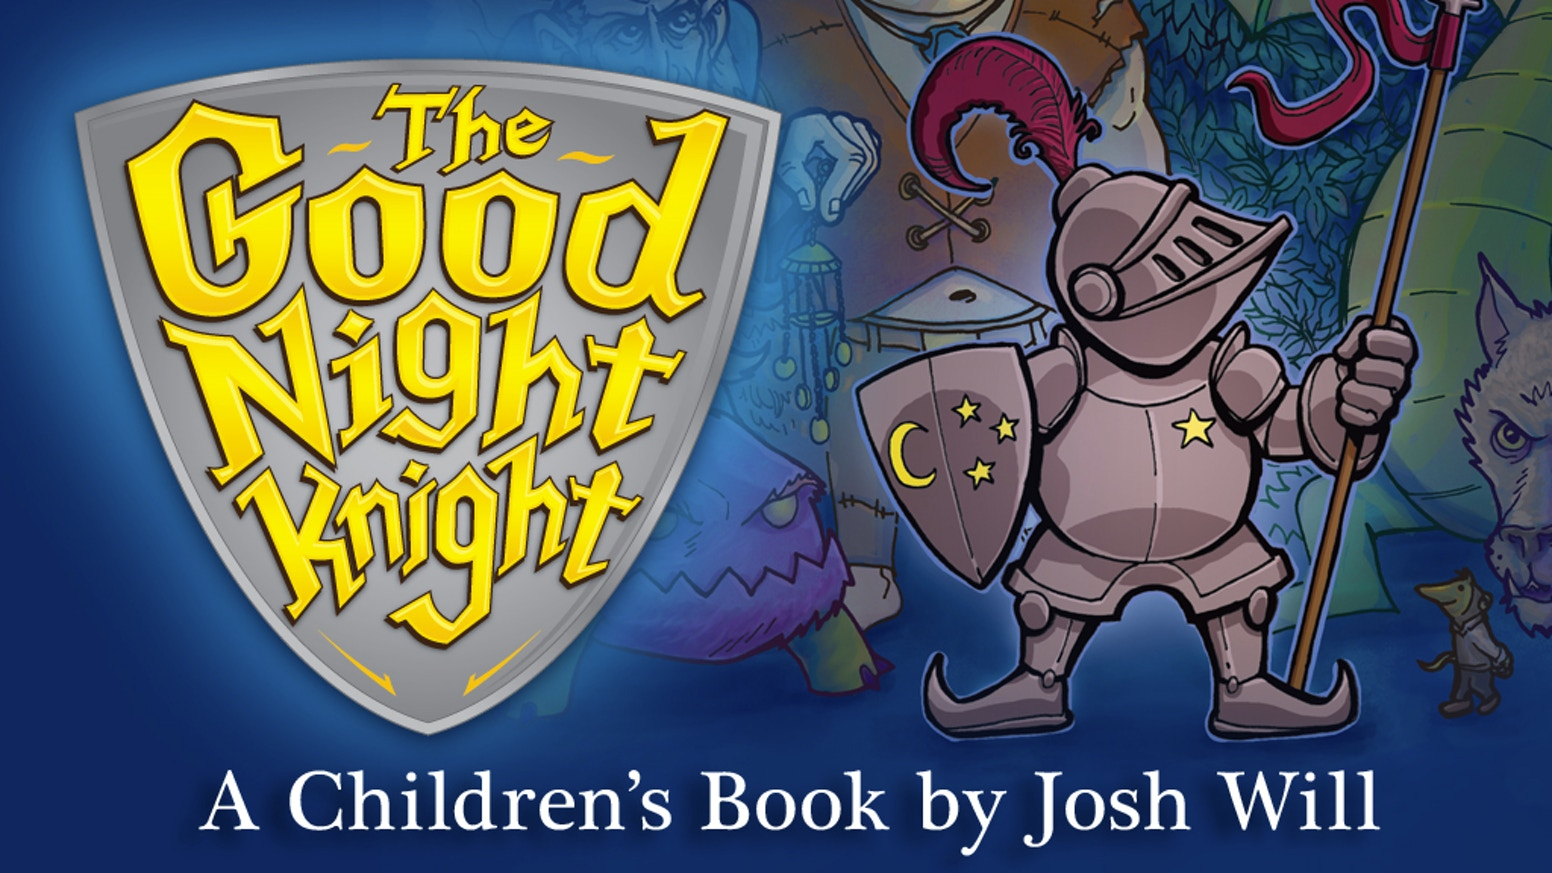 The Good Night Knight children's book